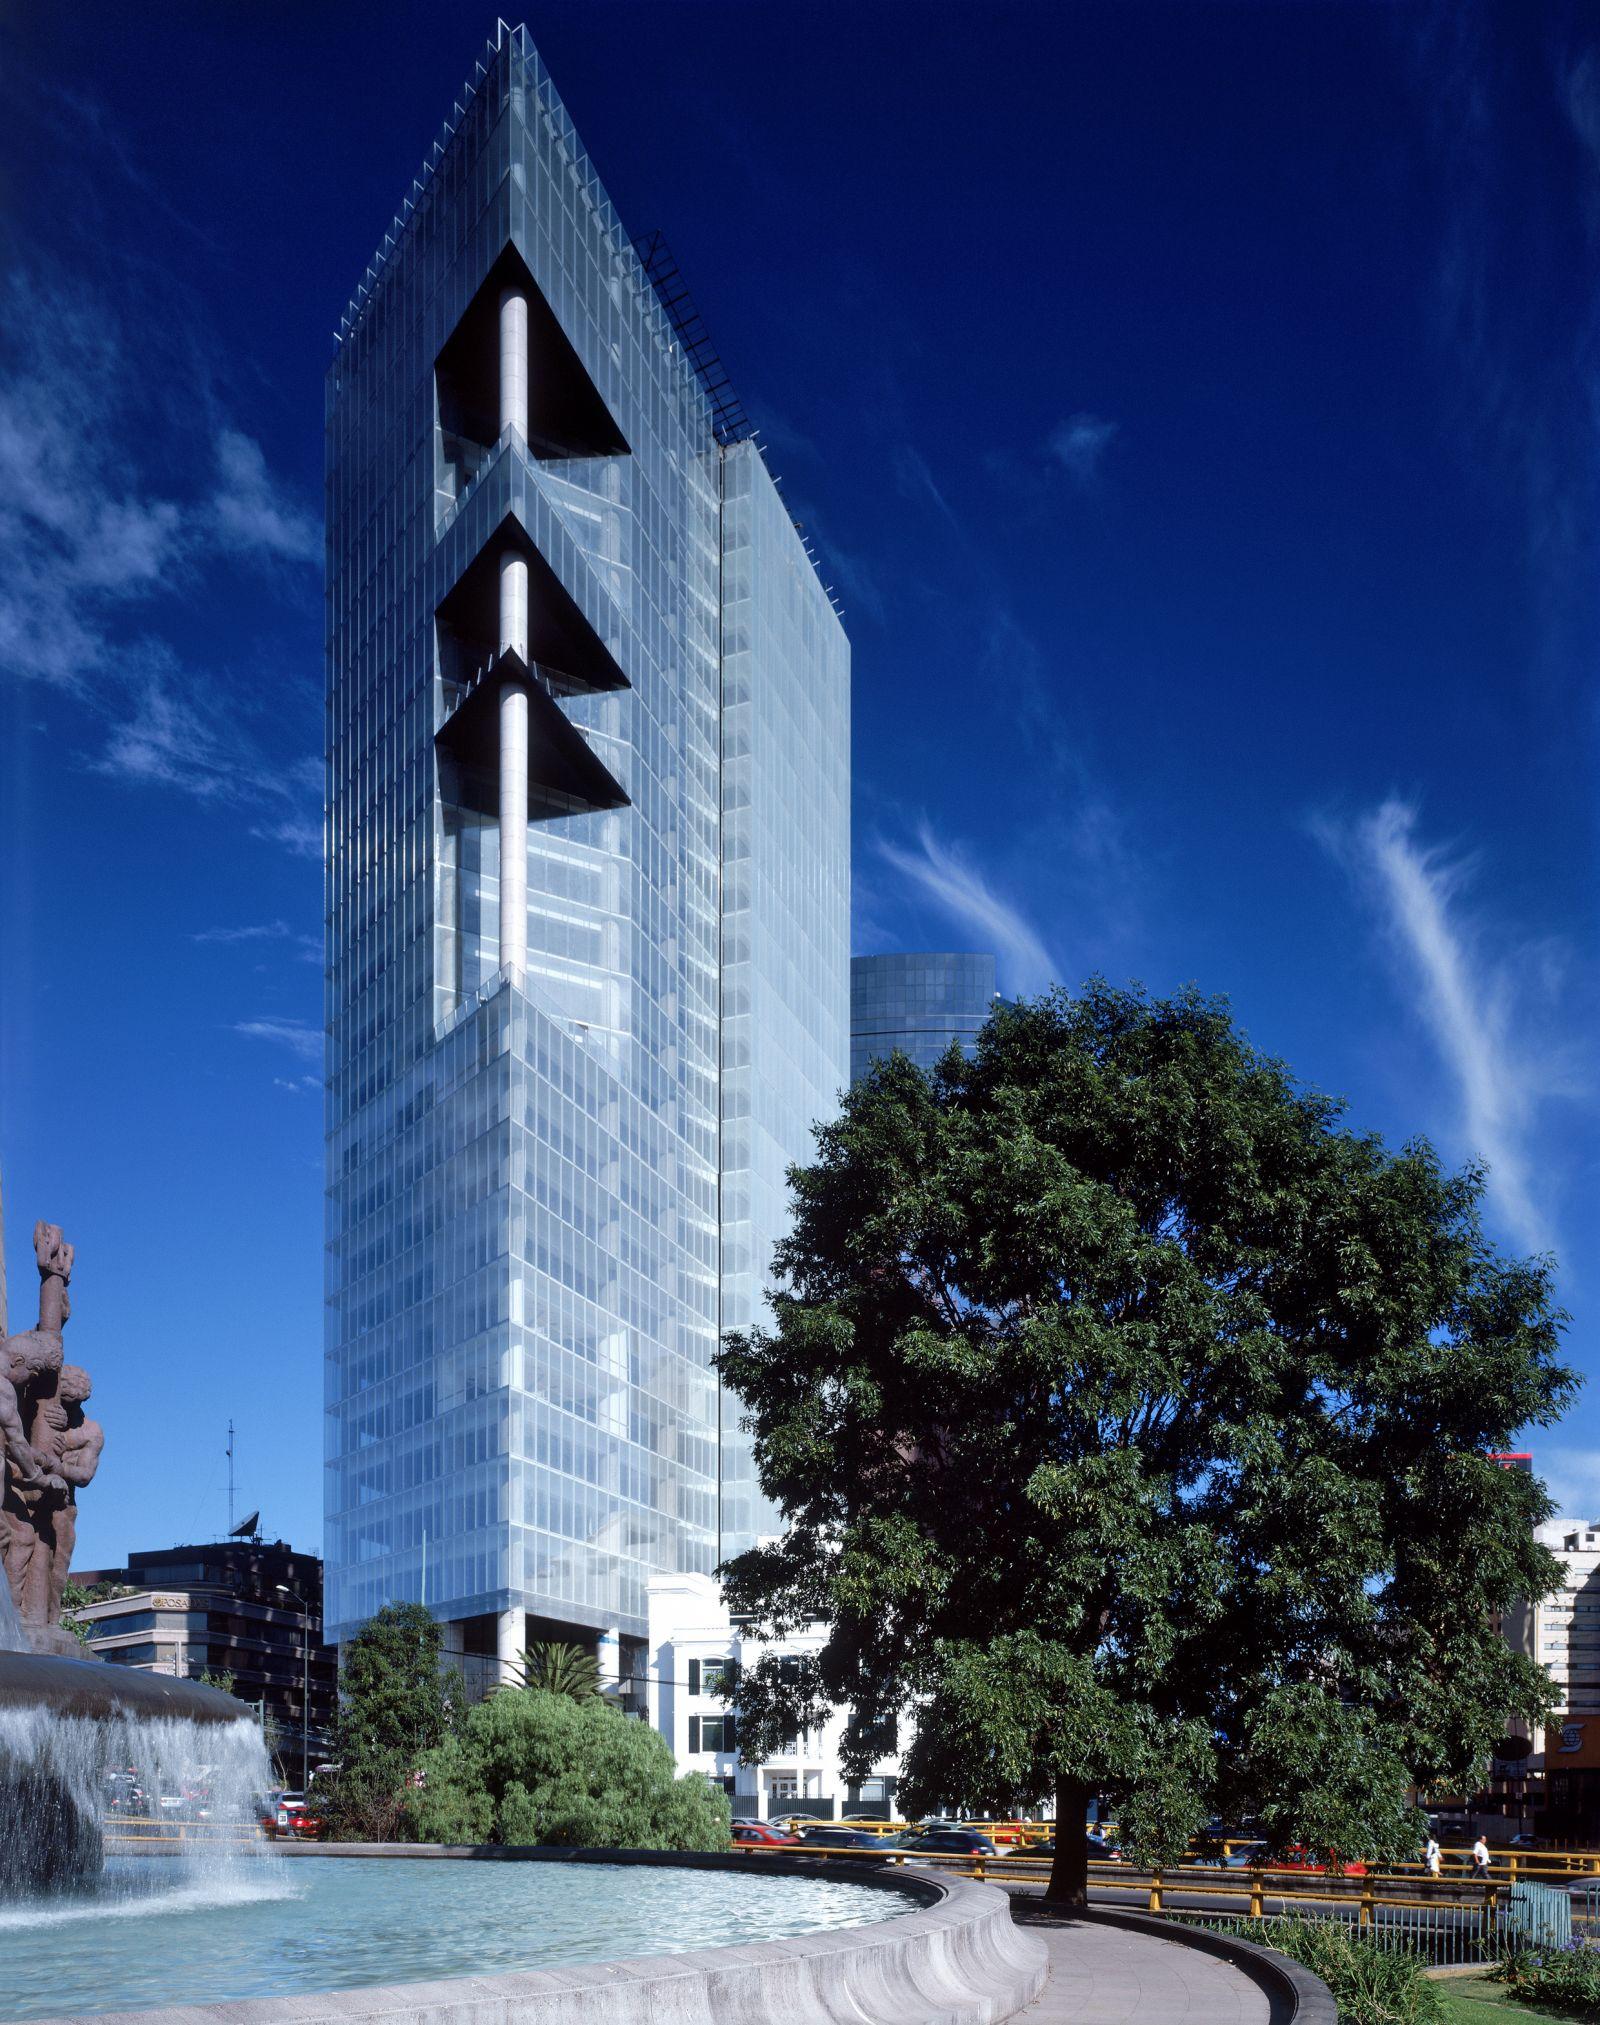 IOS OFFICES 115, Mexico City